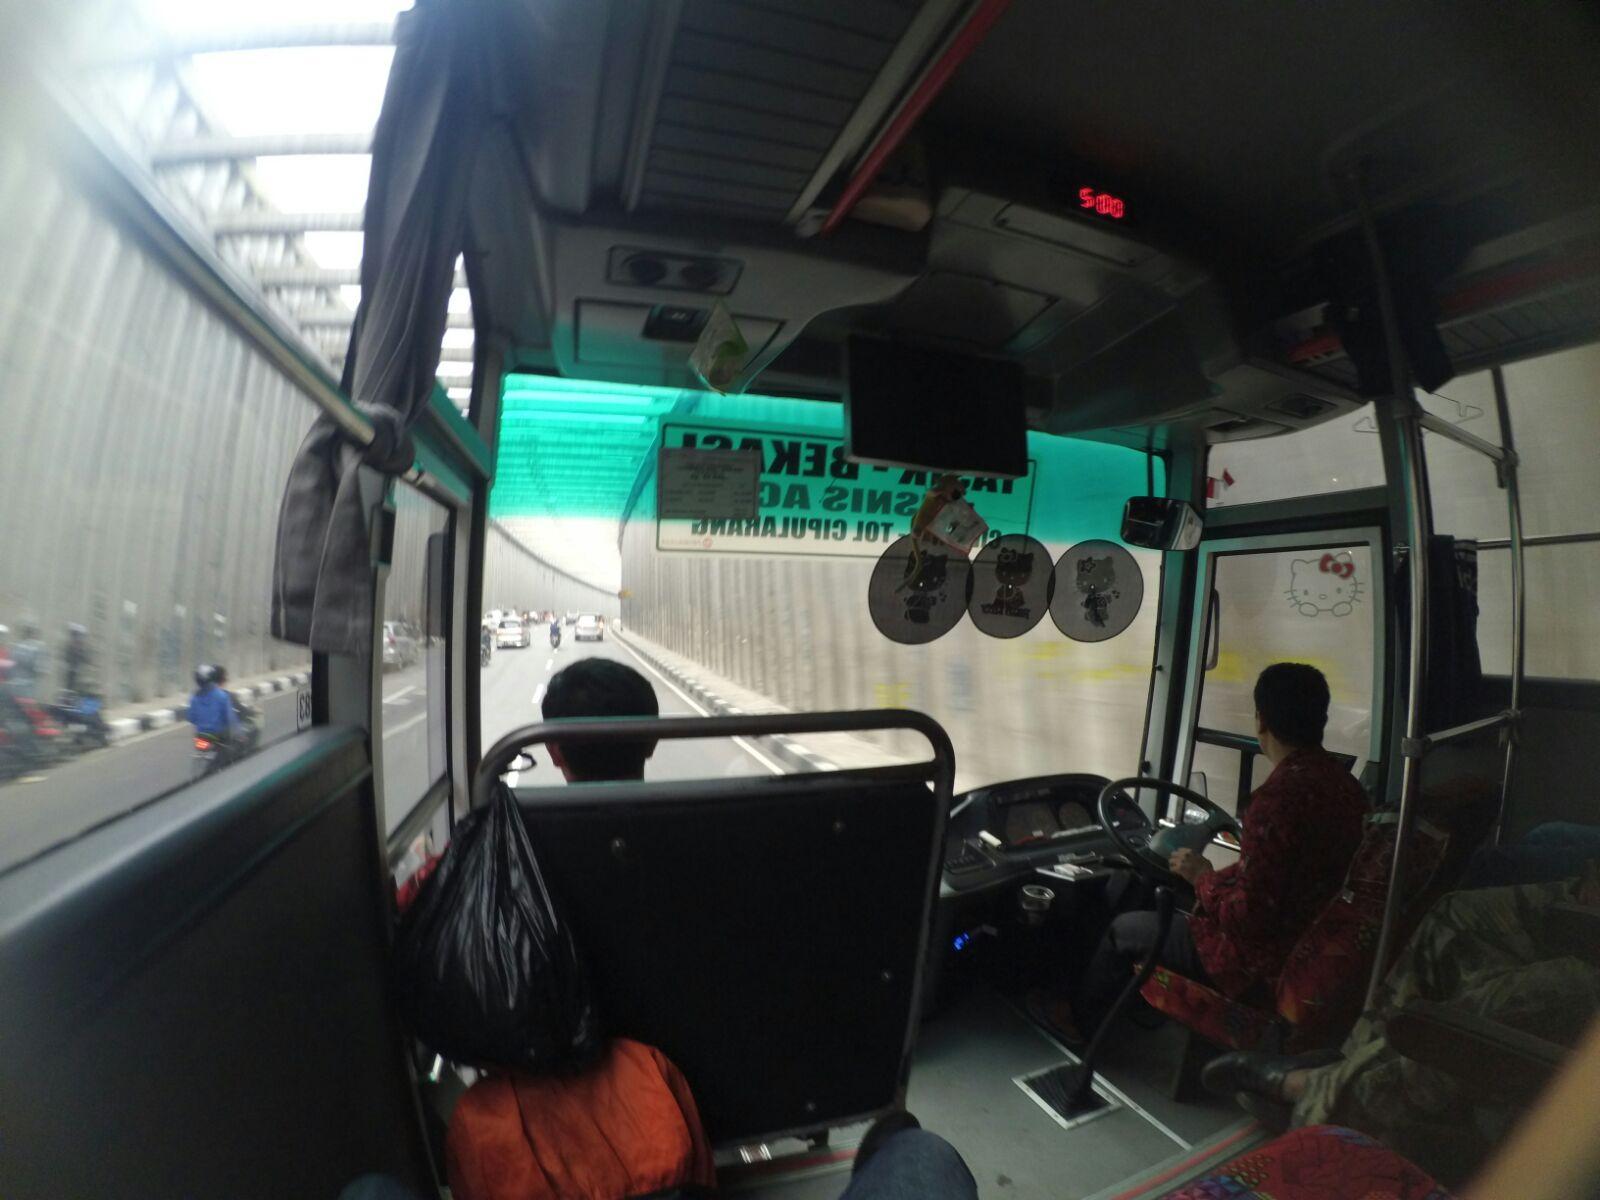 Intermezzo : Lihat Bus Yang Menuju Ke Kampung Halaman ...